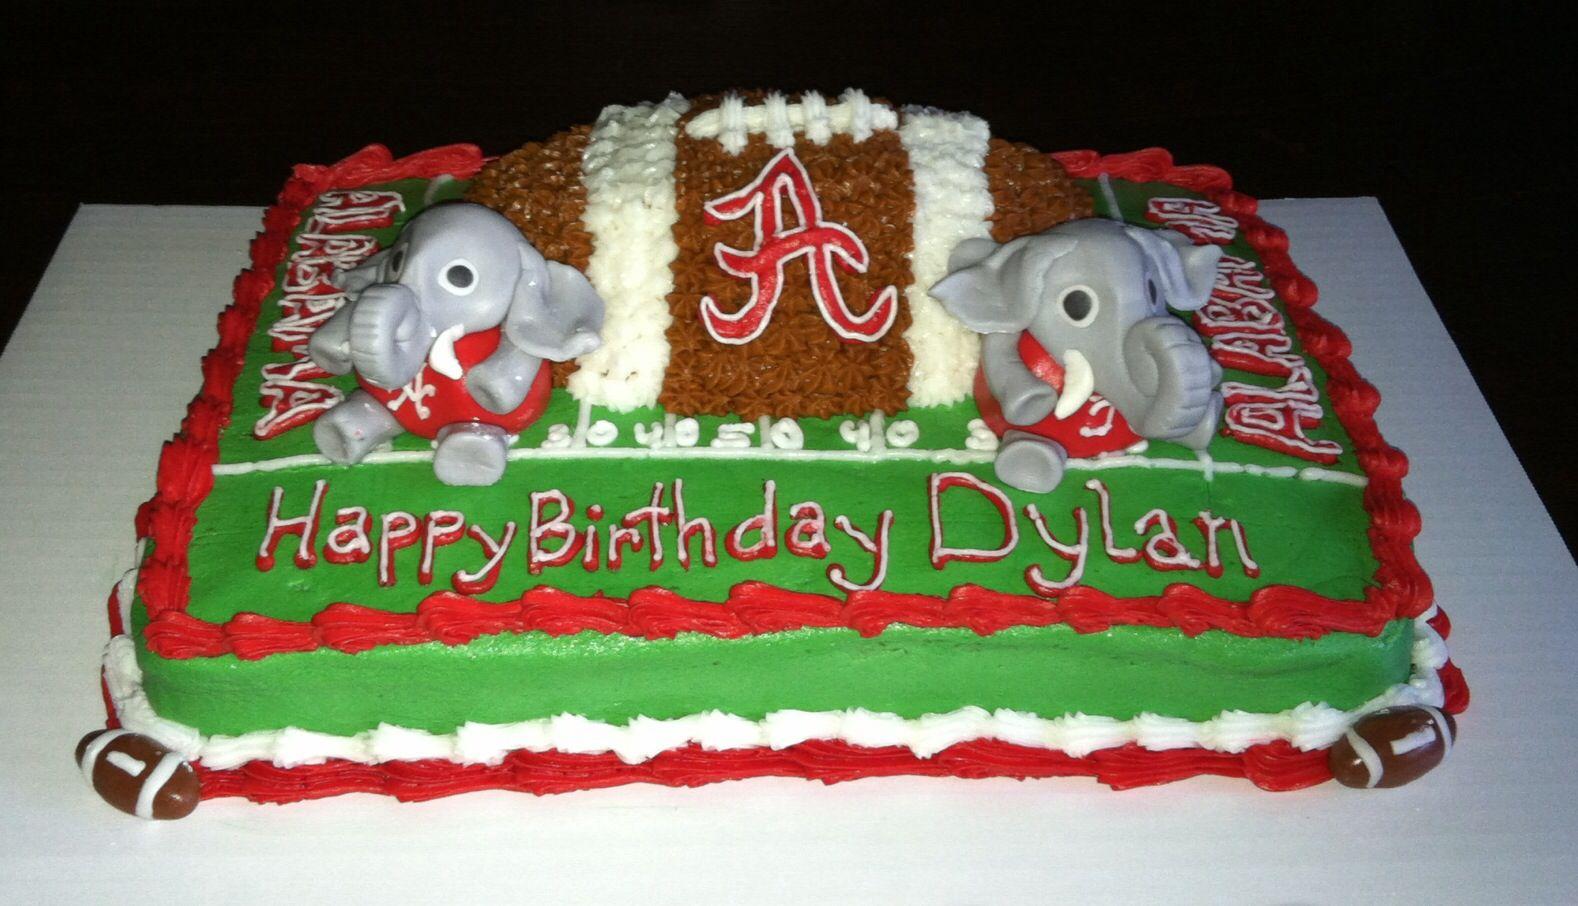 Alabama Cake Sports Apparel Cute Ideas Sayings Etc Pinterest